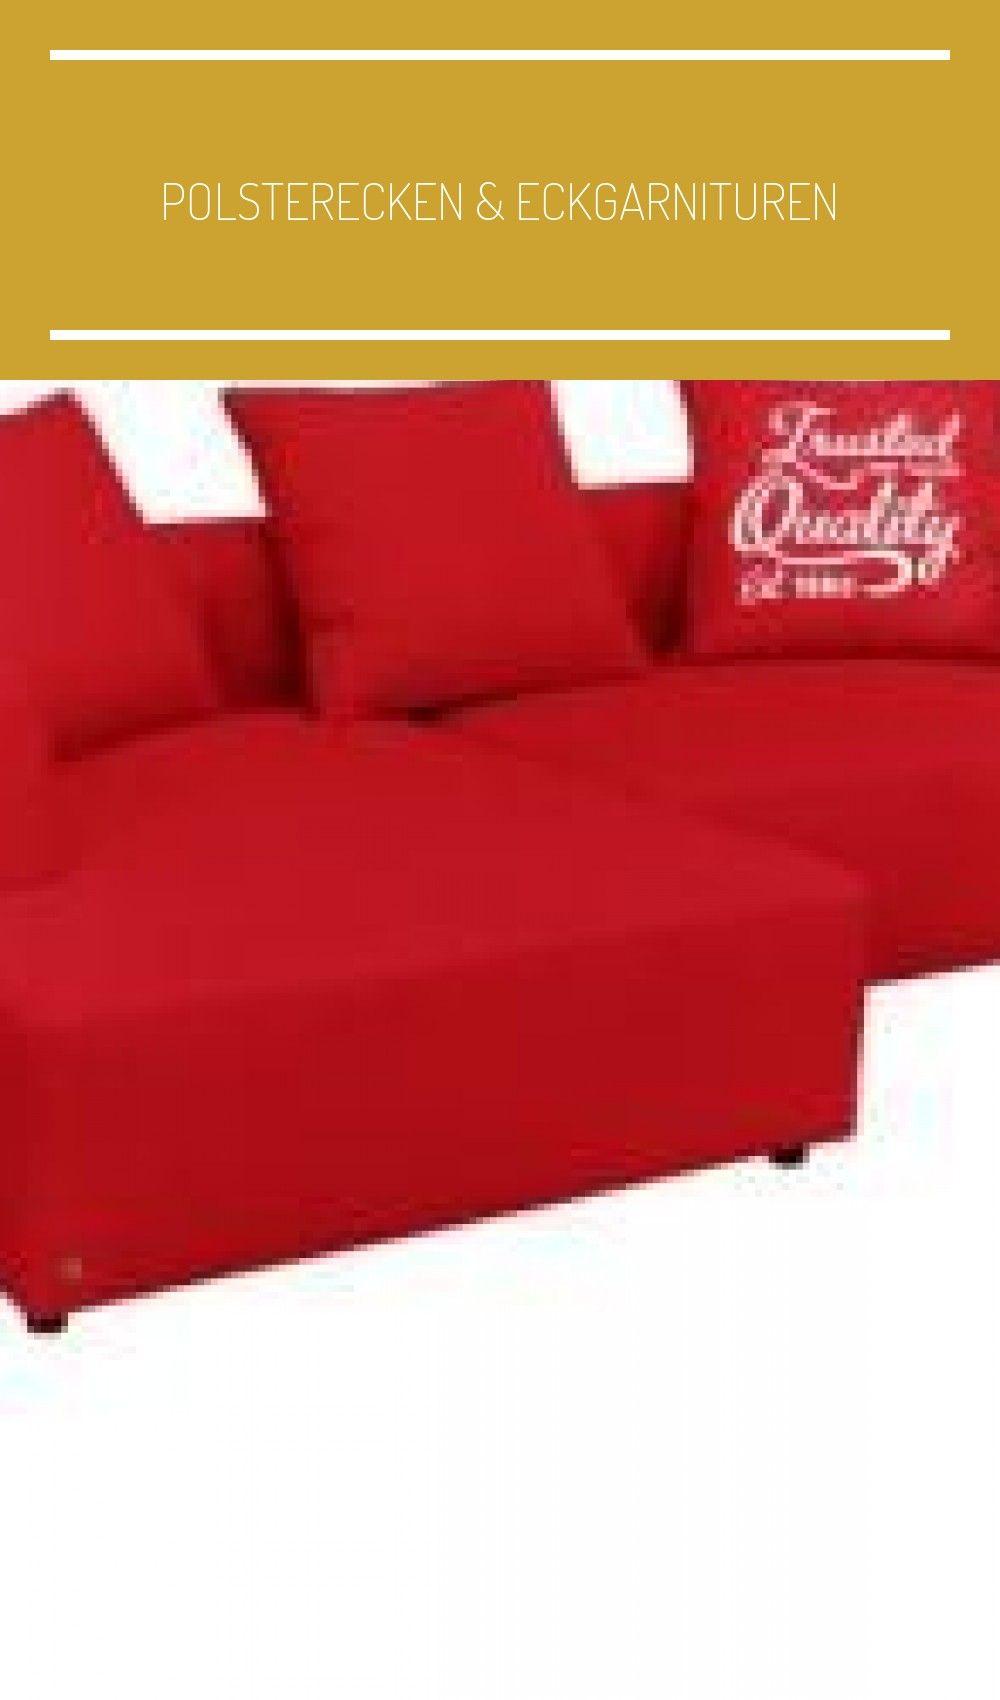 Ecksofa Heaven Casual Colors S Tom Tailortom Tailor Estilo Vintage Habitaciones Polsterecken Eckgarnituren In 2020 Chaise Lounge Sofa Chaise